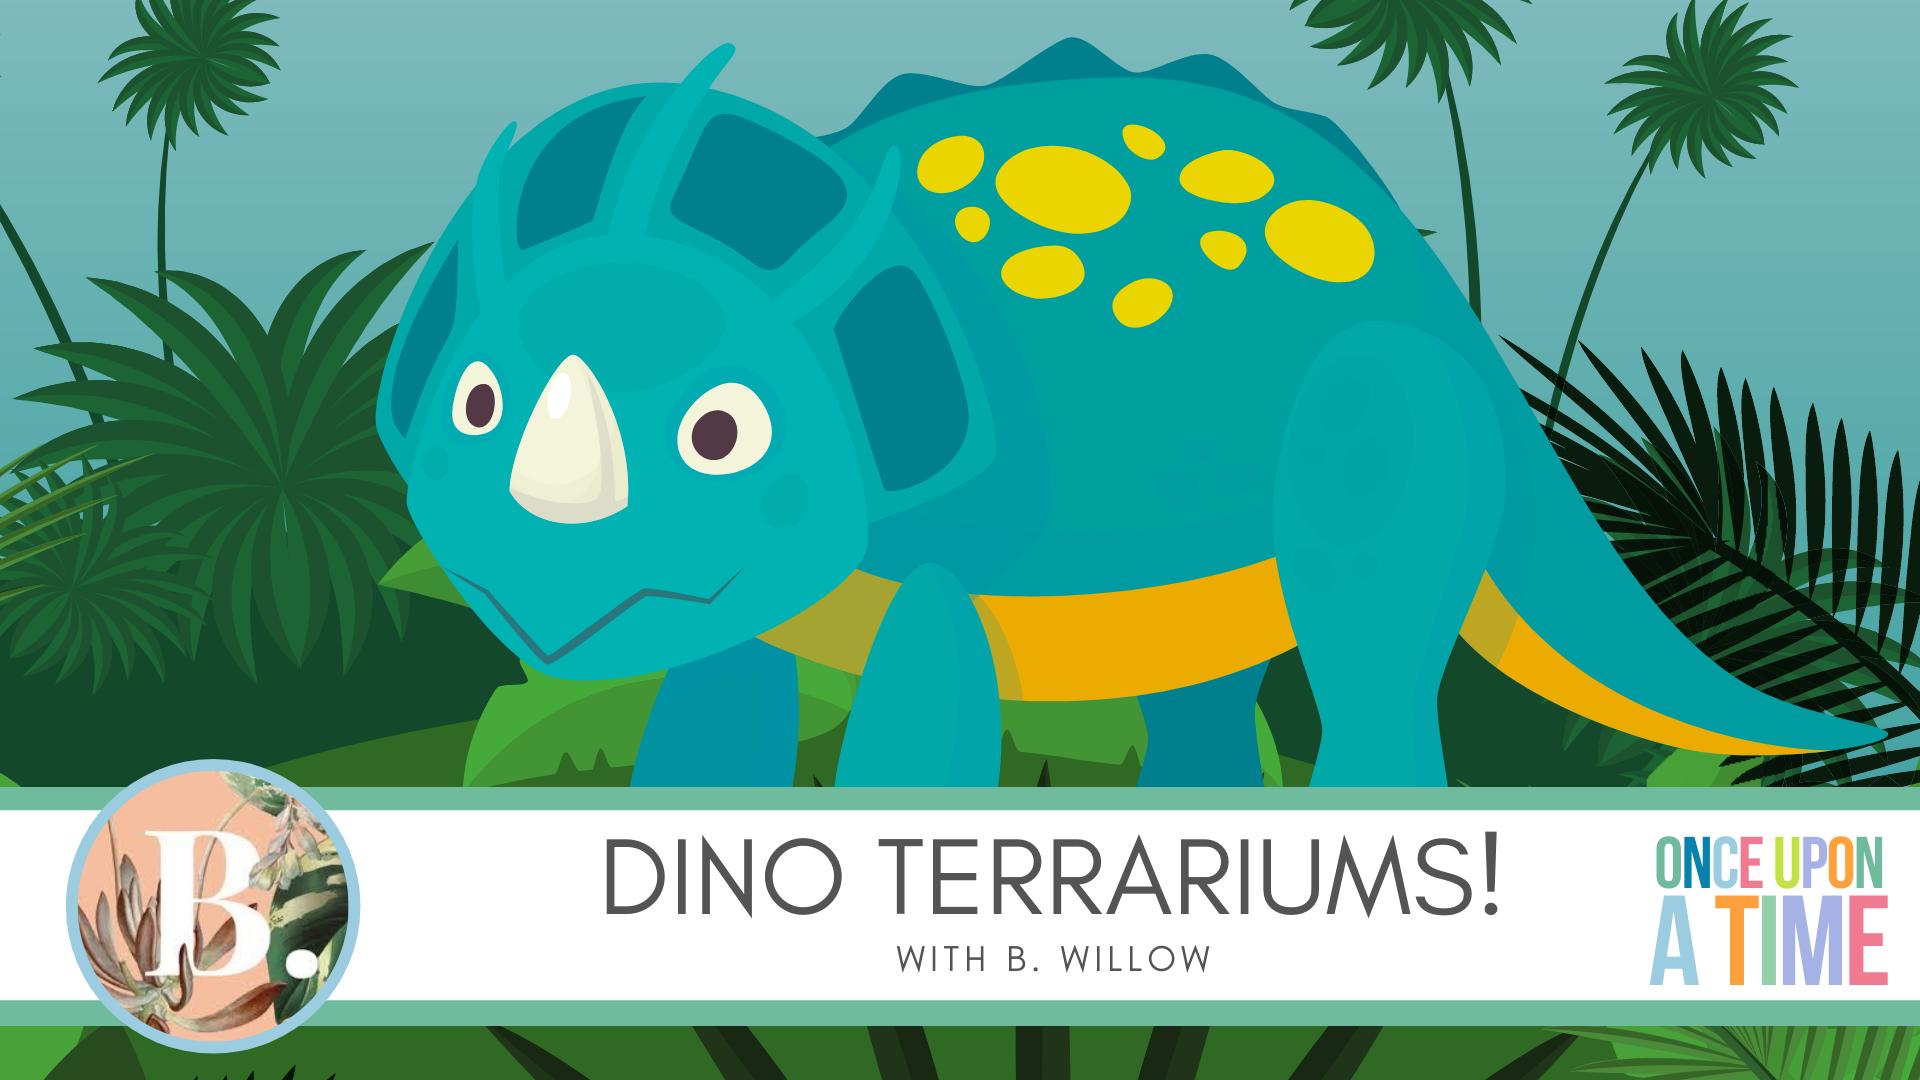 Dino Terrariums